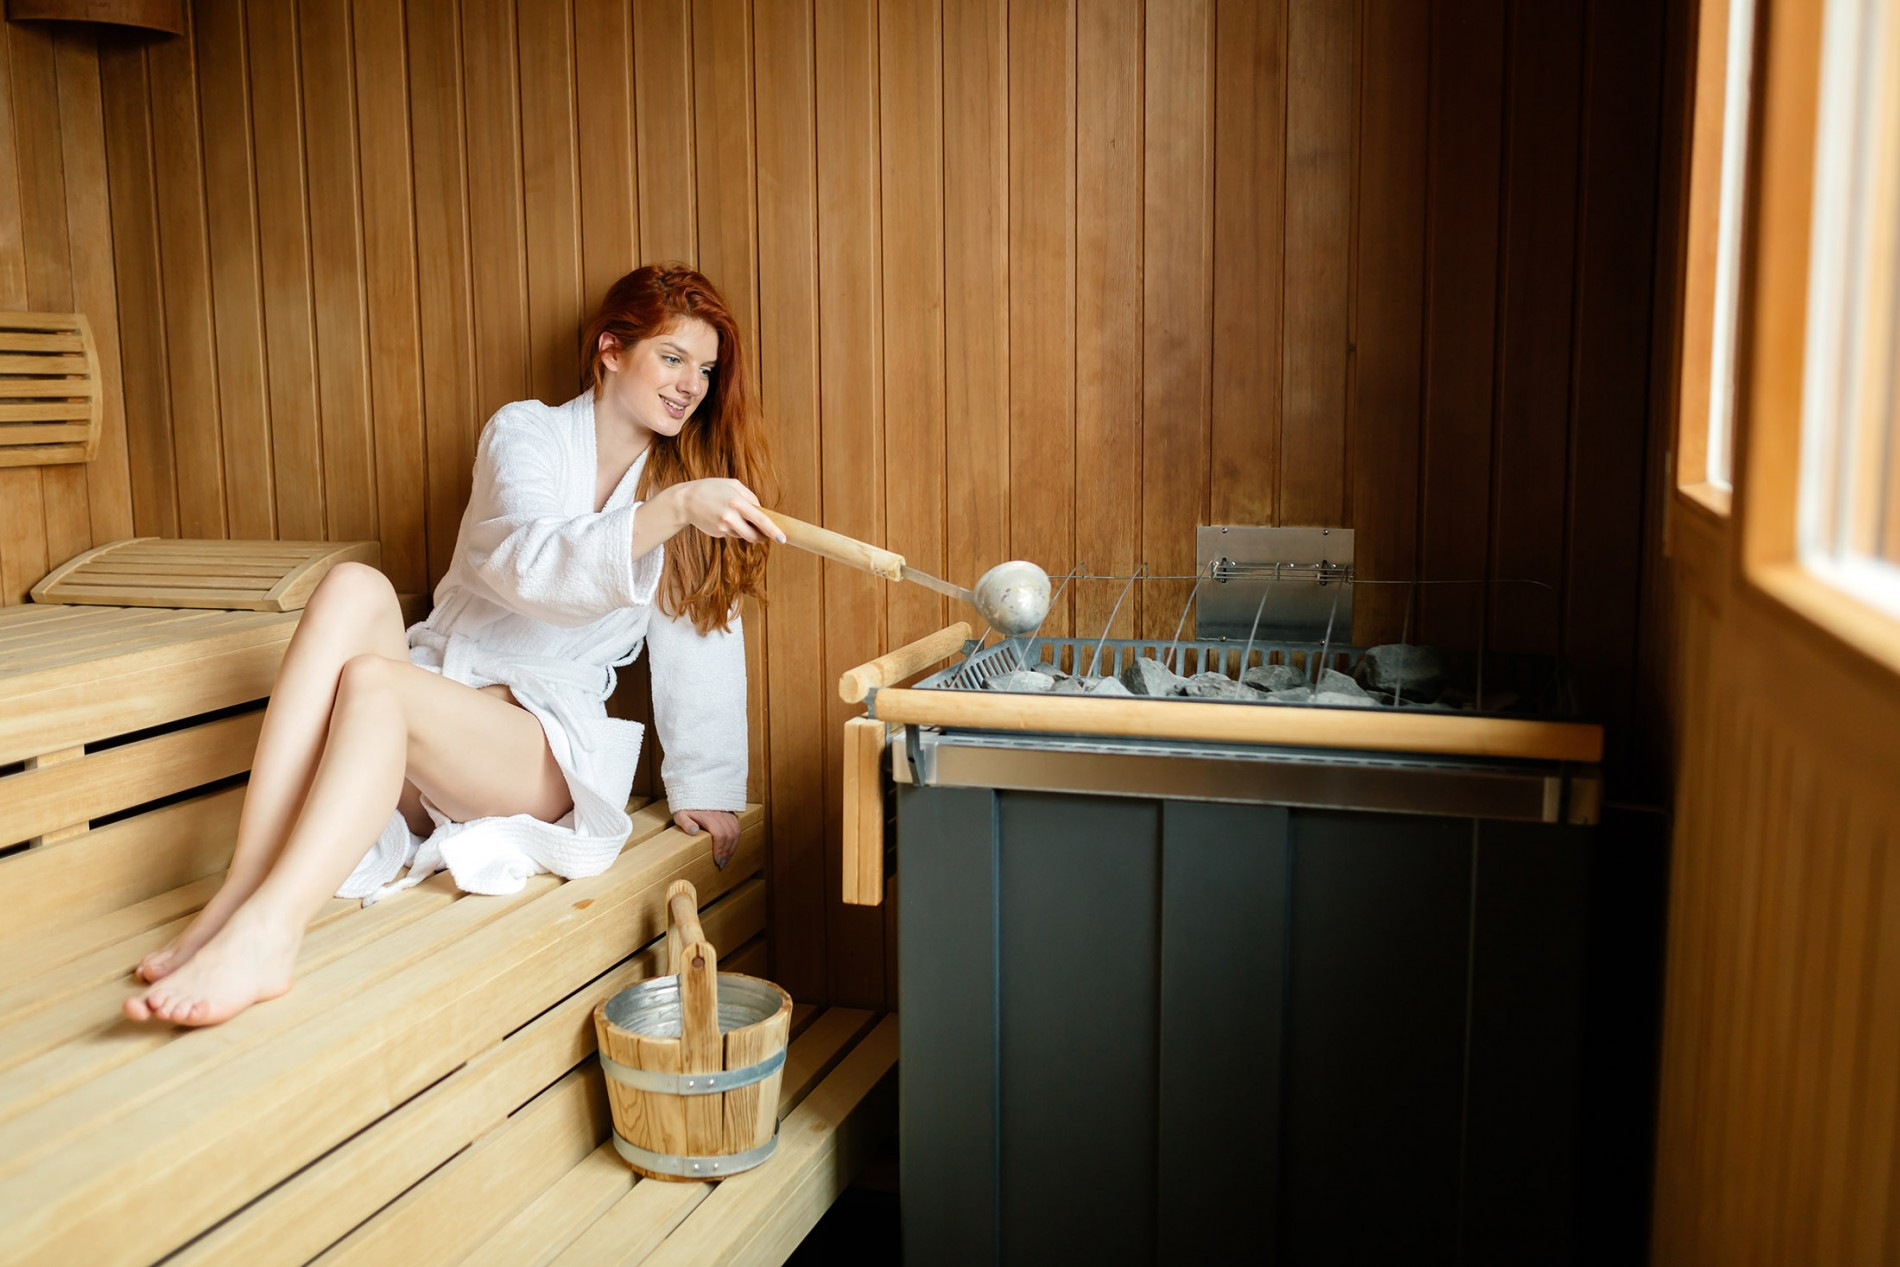 Saunathermen5mei - Ontgiften in de sauna